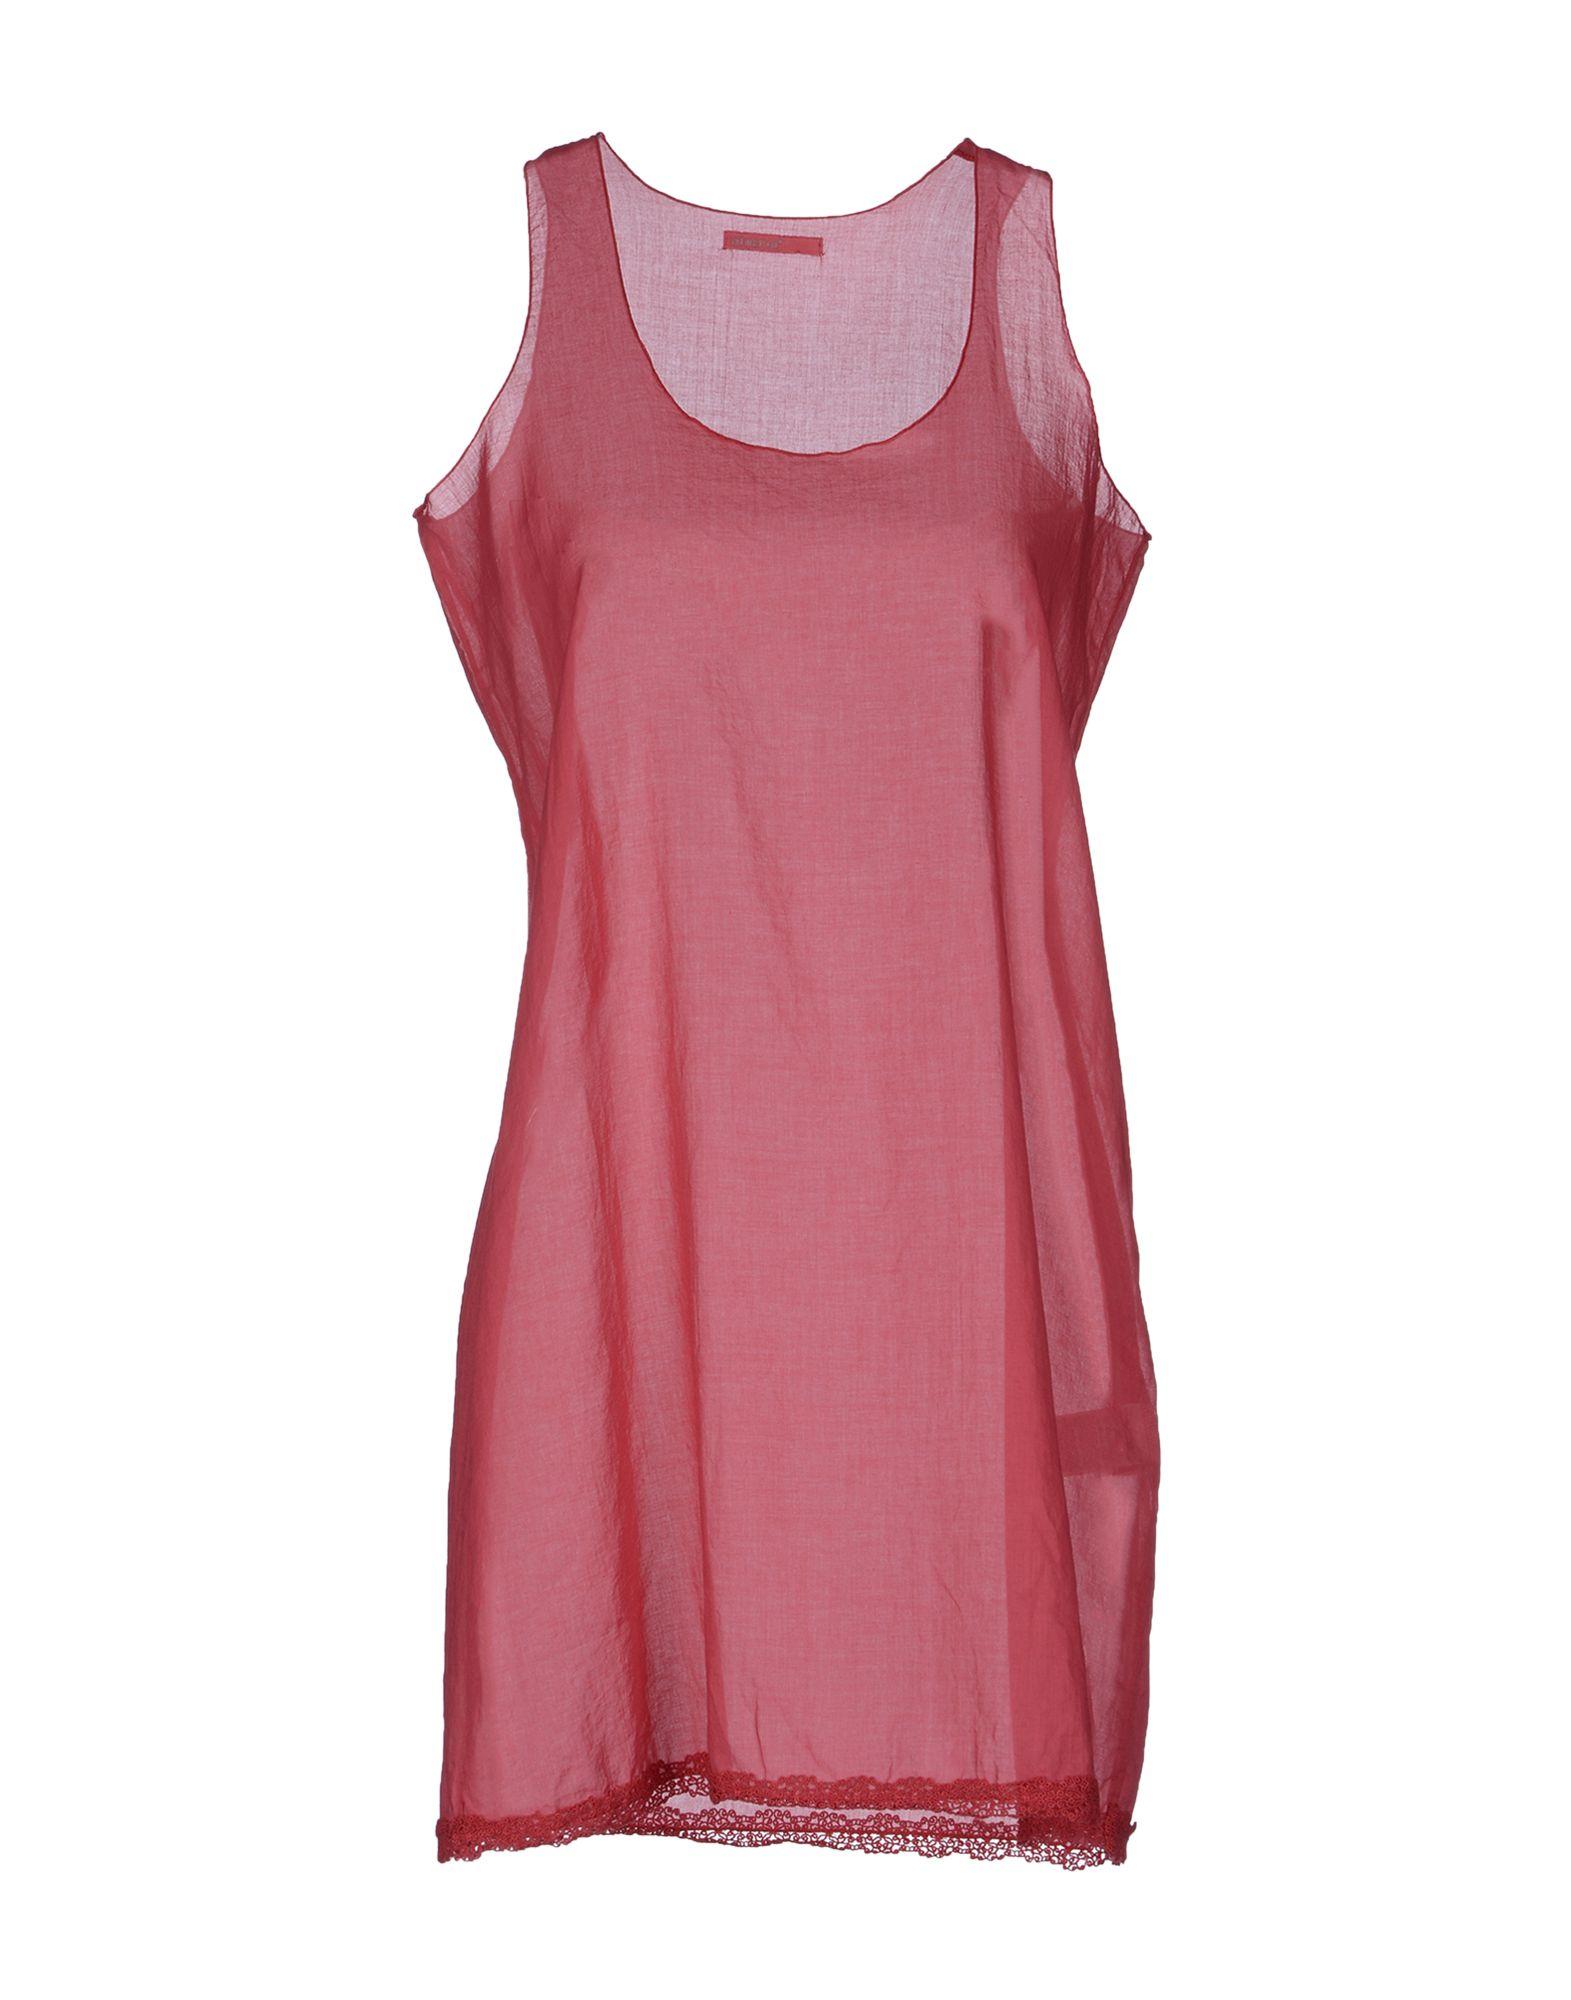 Almeria short dress in pink pastel pink lyst for Pastel pink dress shirt